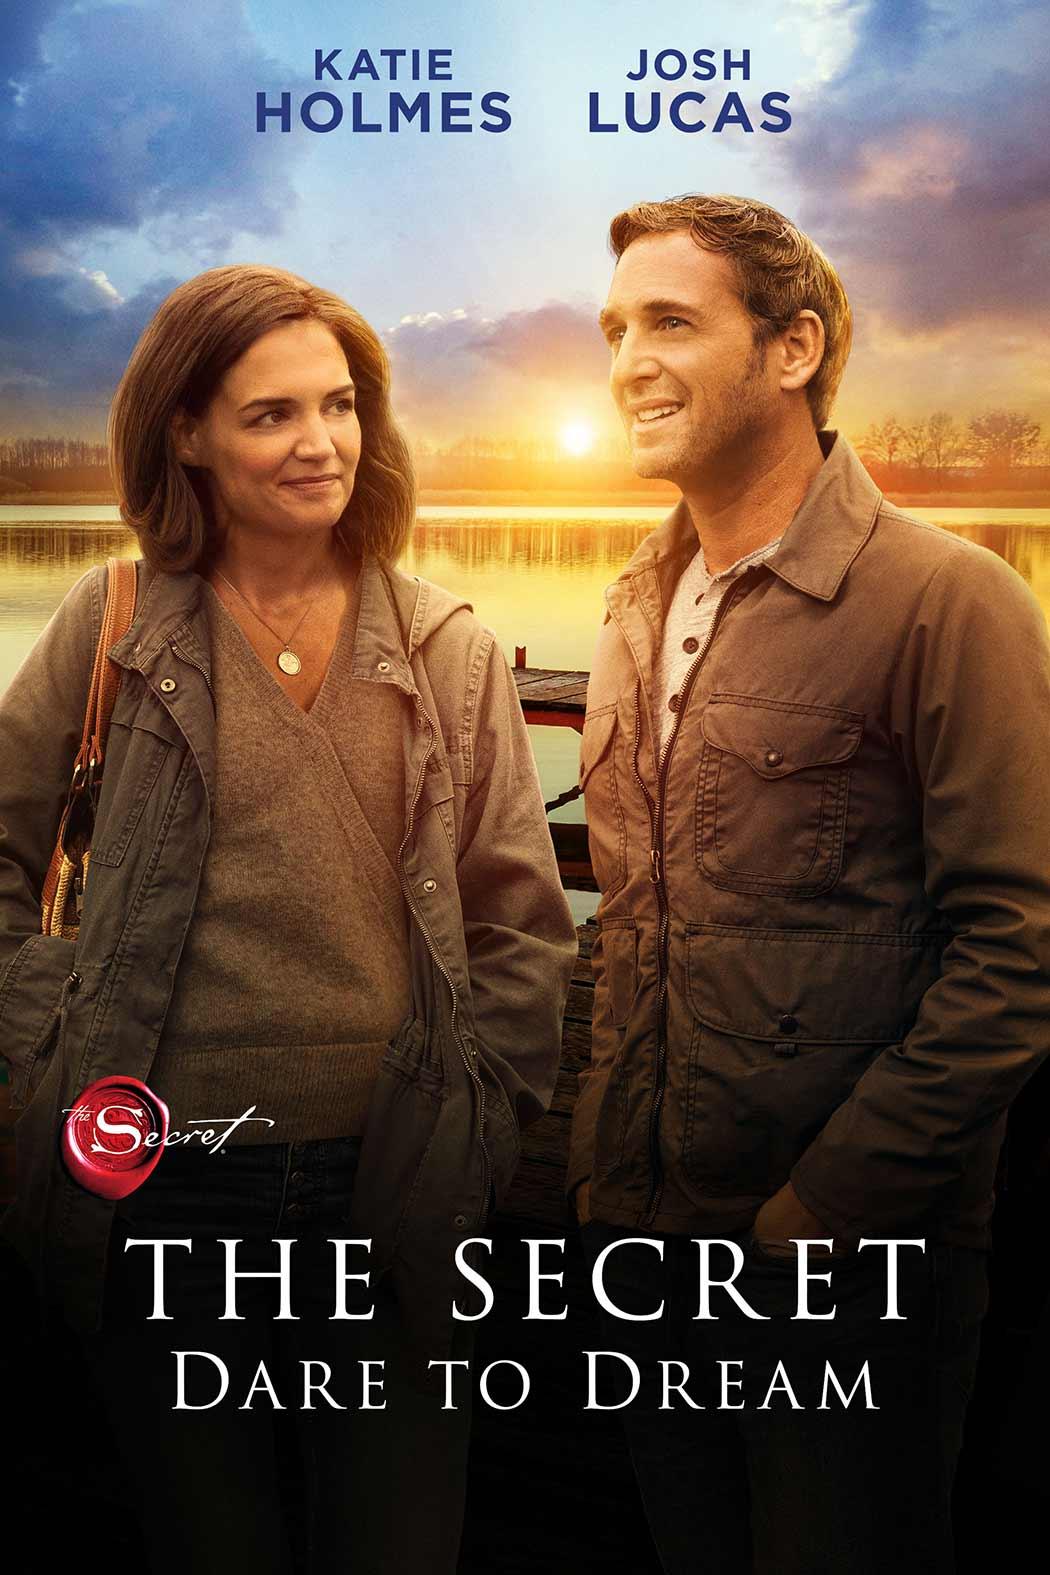 the secret movie